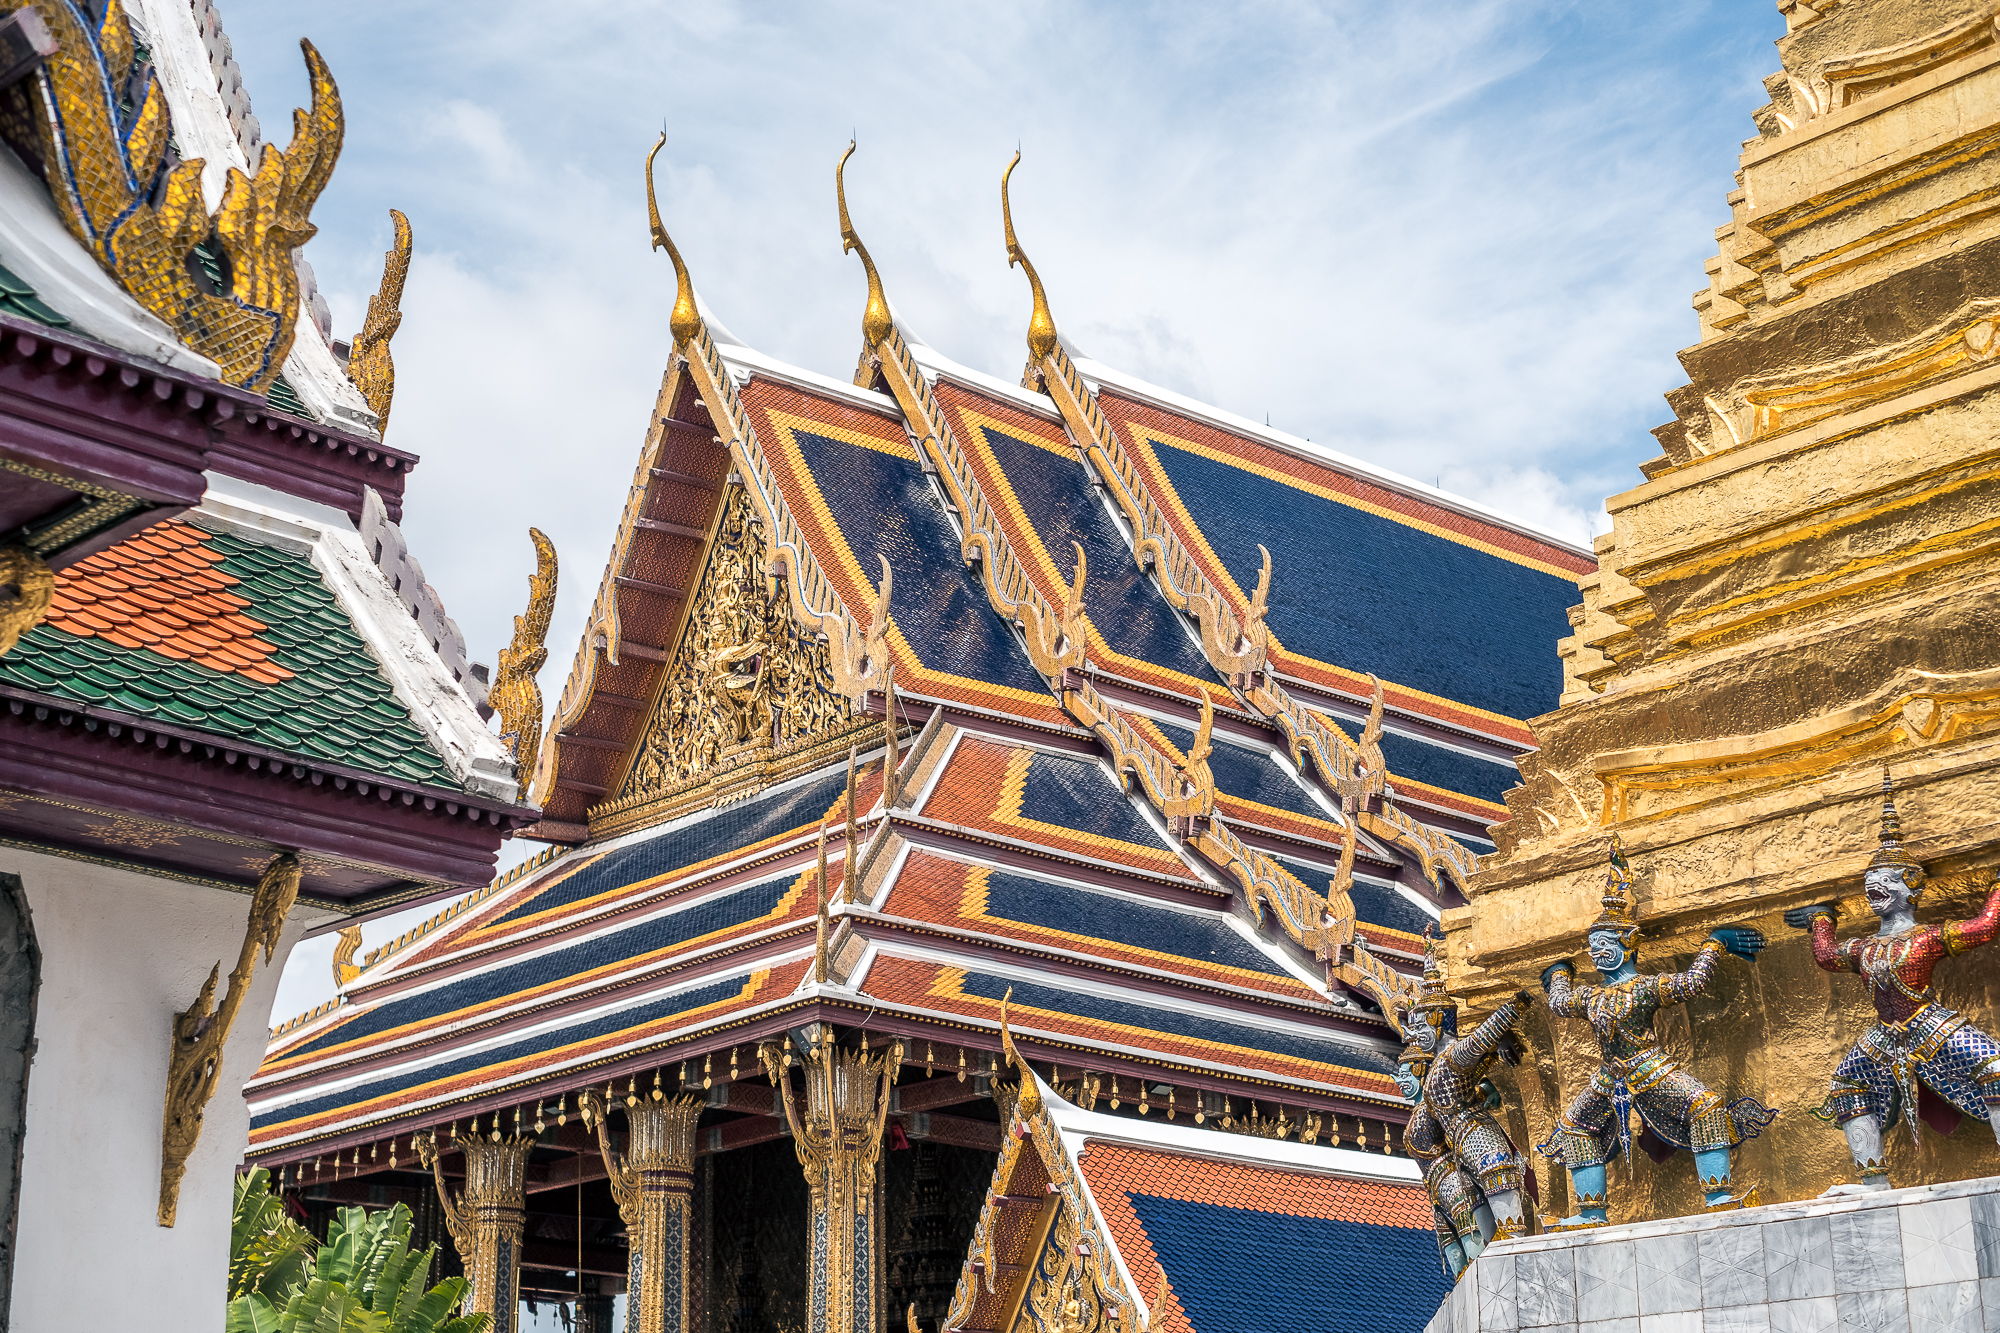 THAILAND_Honeymoon_TheOutsiderBlog_DSCF0194.JPG